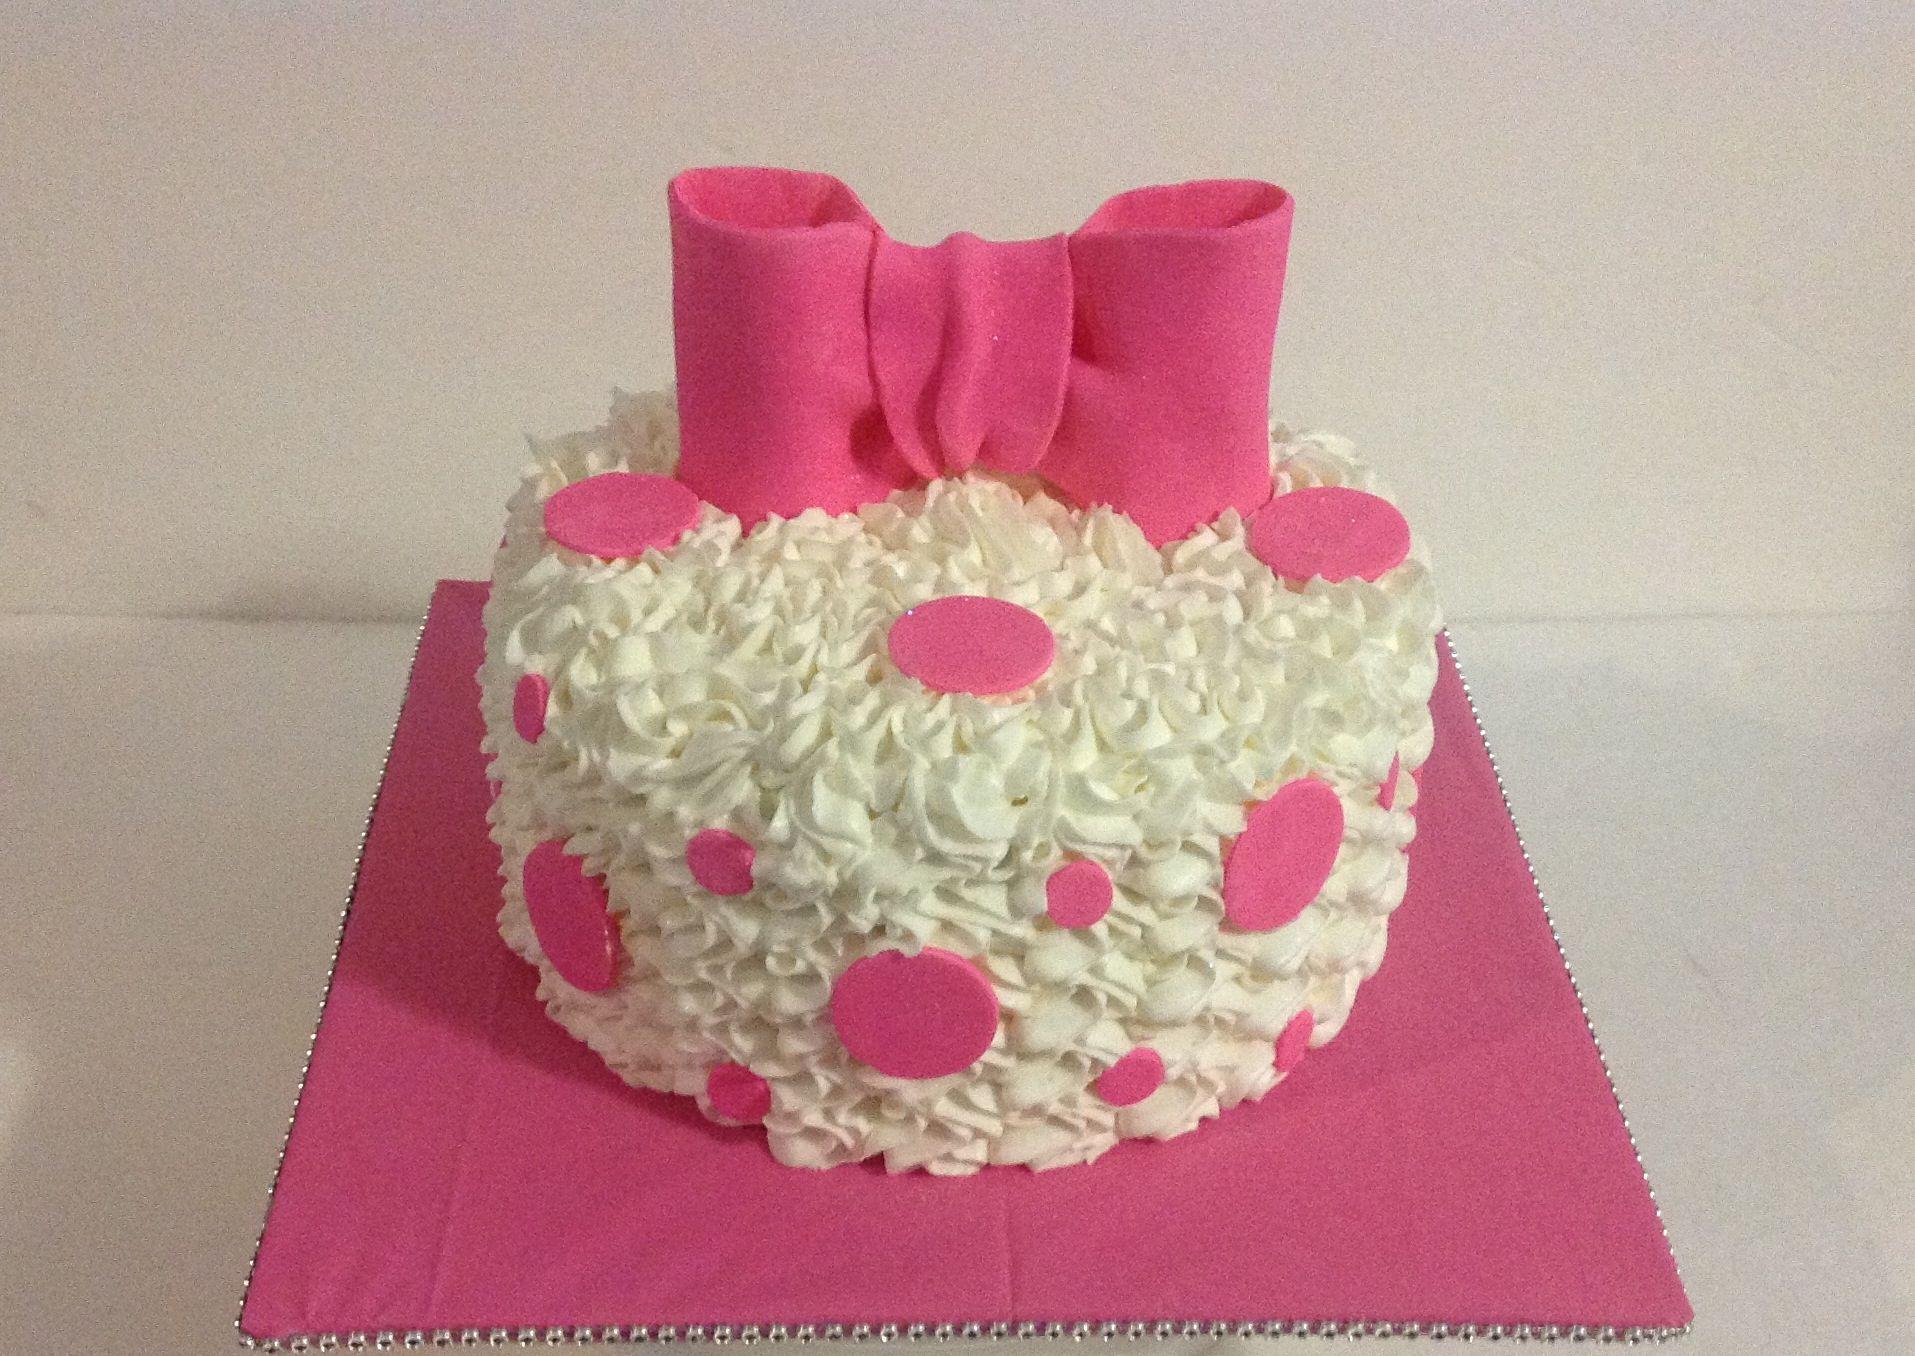 Pink polka dot and bow cake